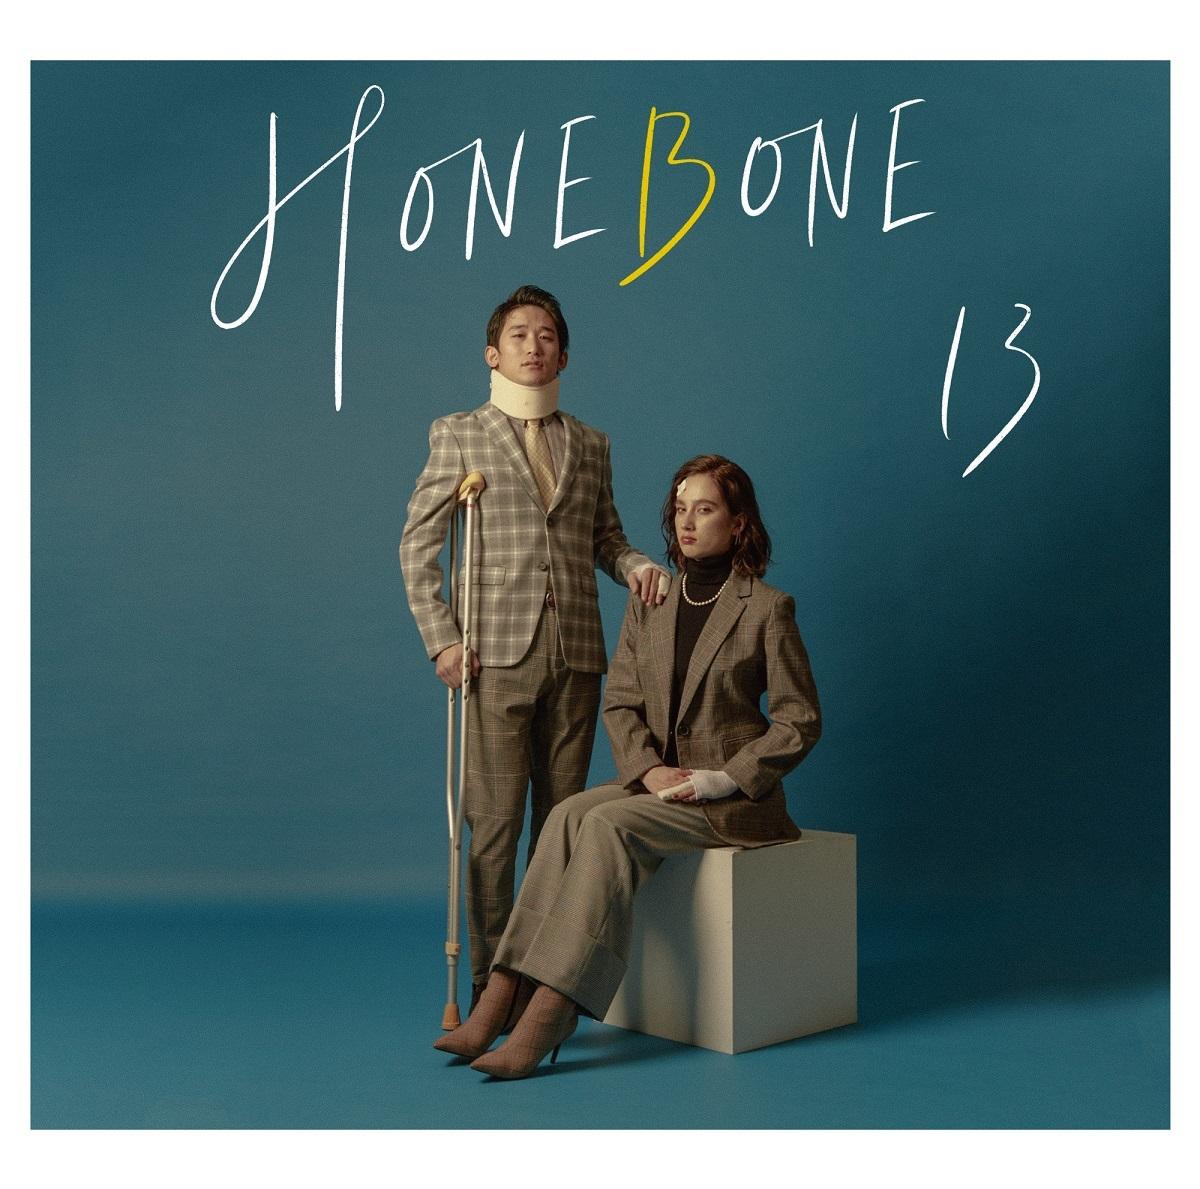 HONEBONE ニューアルバム『13』